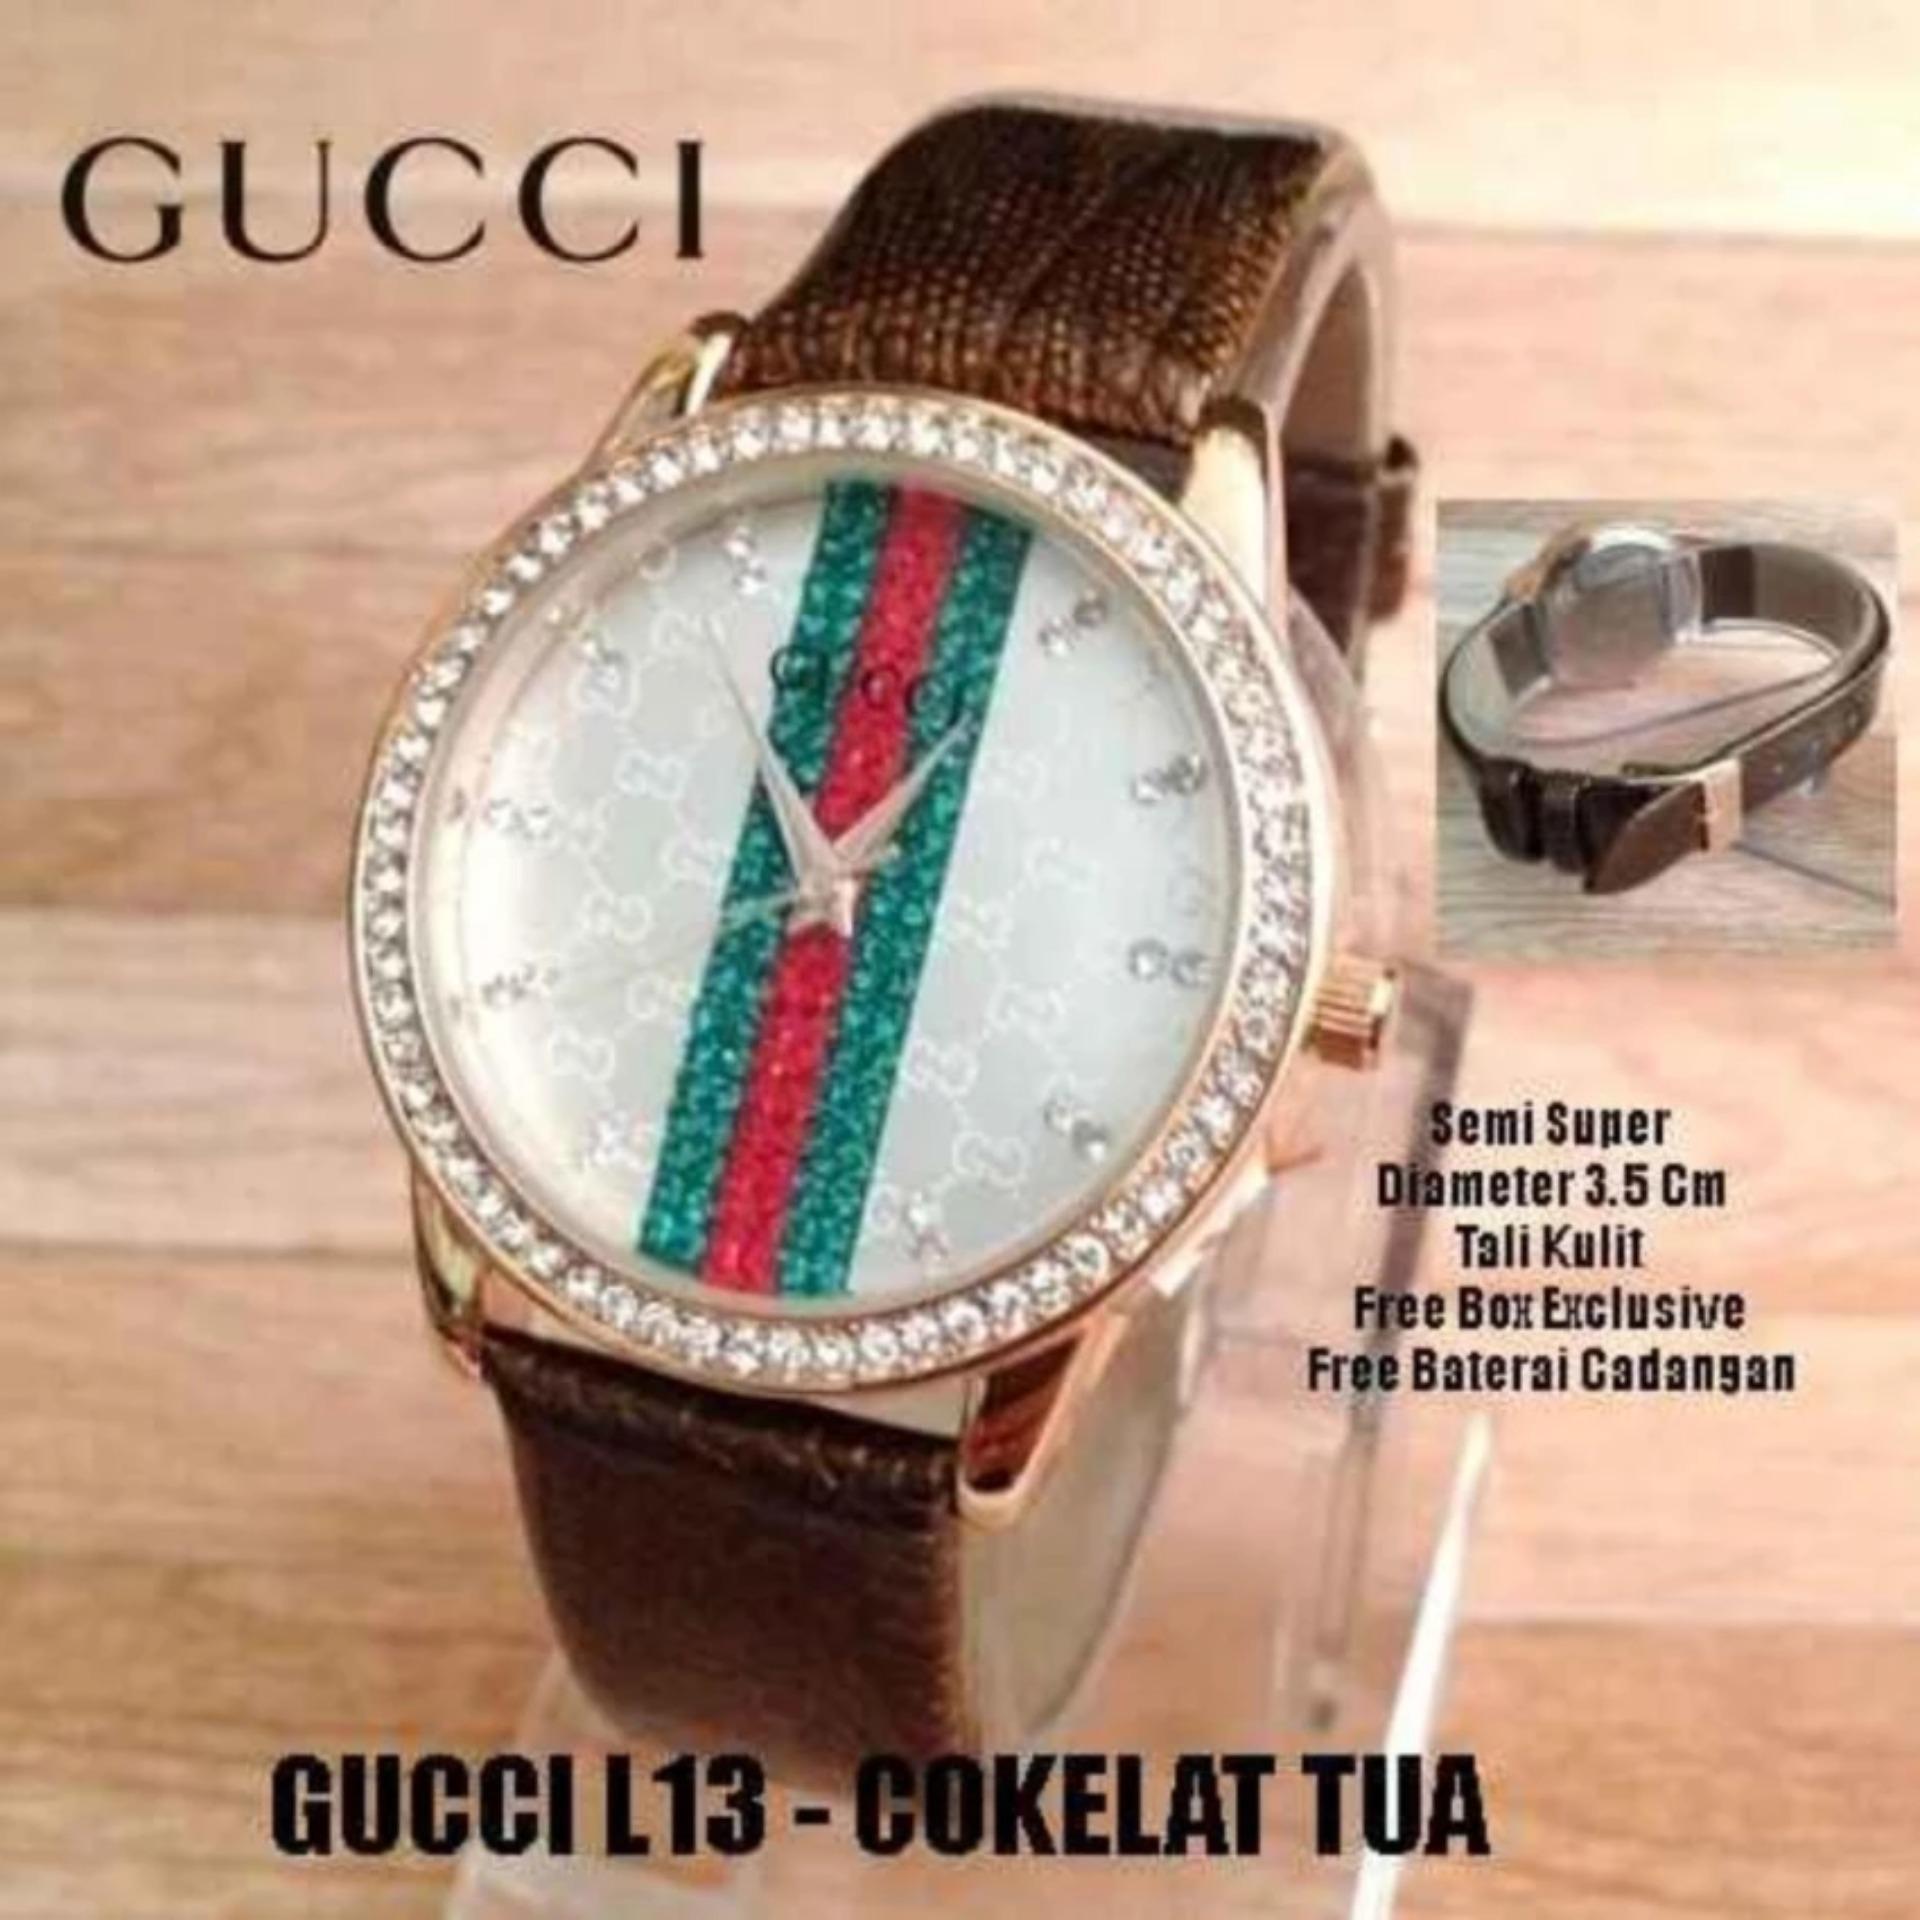 Jam Tangan Fashion Wanita Wacta Gucci Silver5 Daftar Harga Terkini Valentino Rudy Vr108 2337 Silver Black Flash Sale Tali Kulit Two Tone